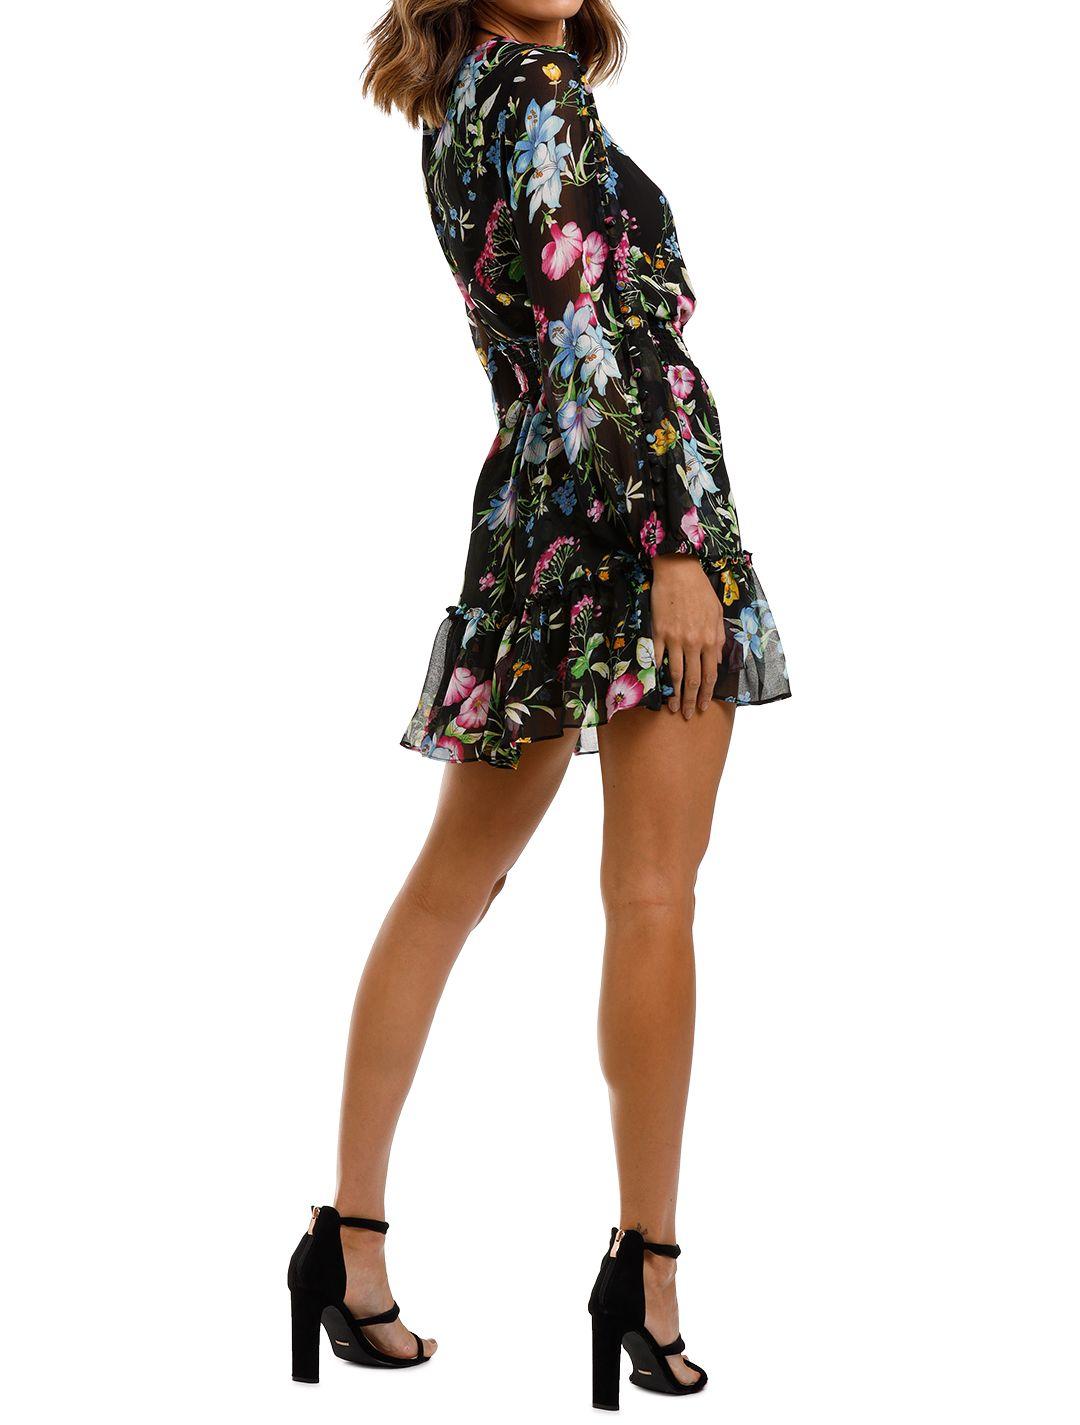 Misa LA Callae Dress long sleeve